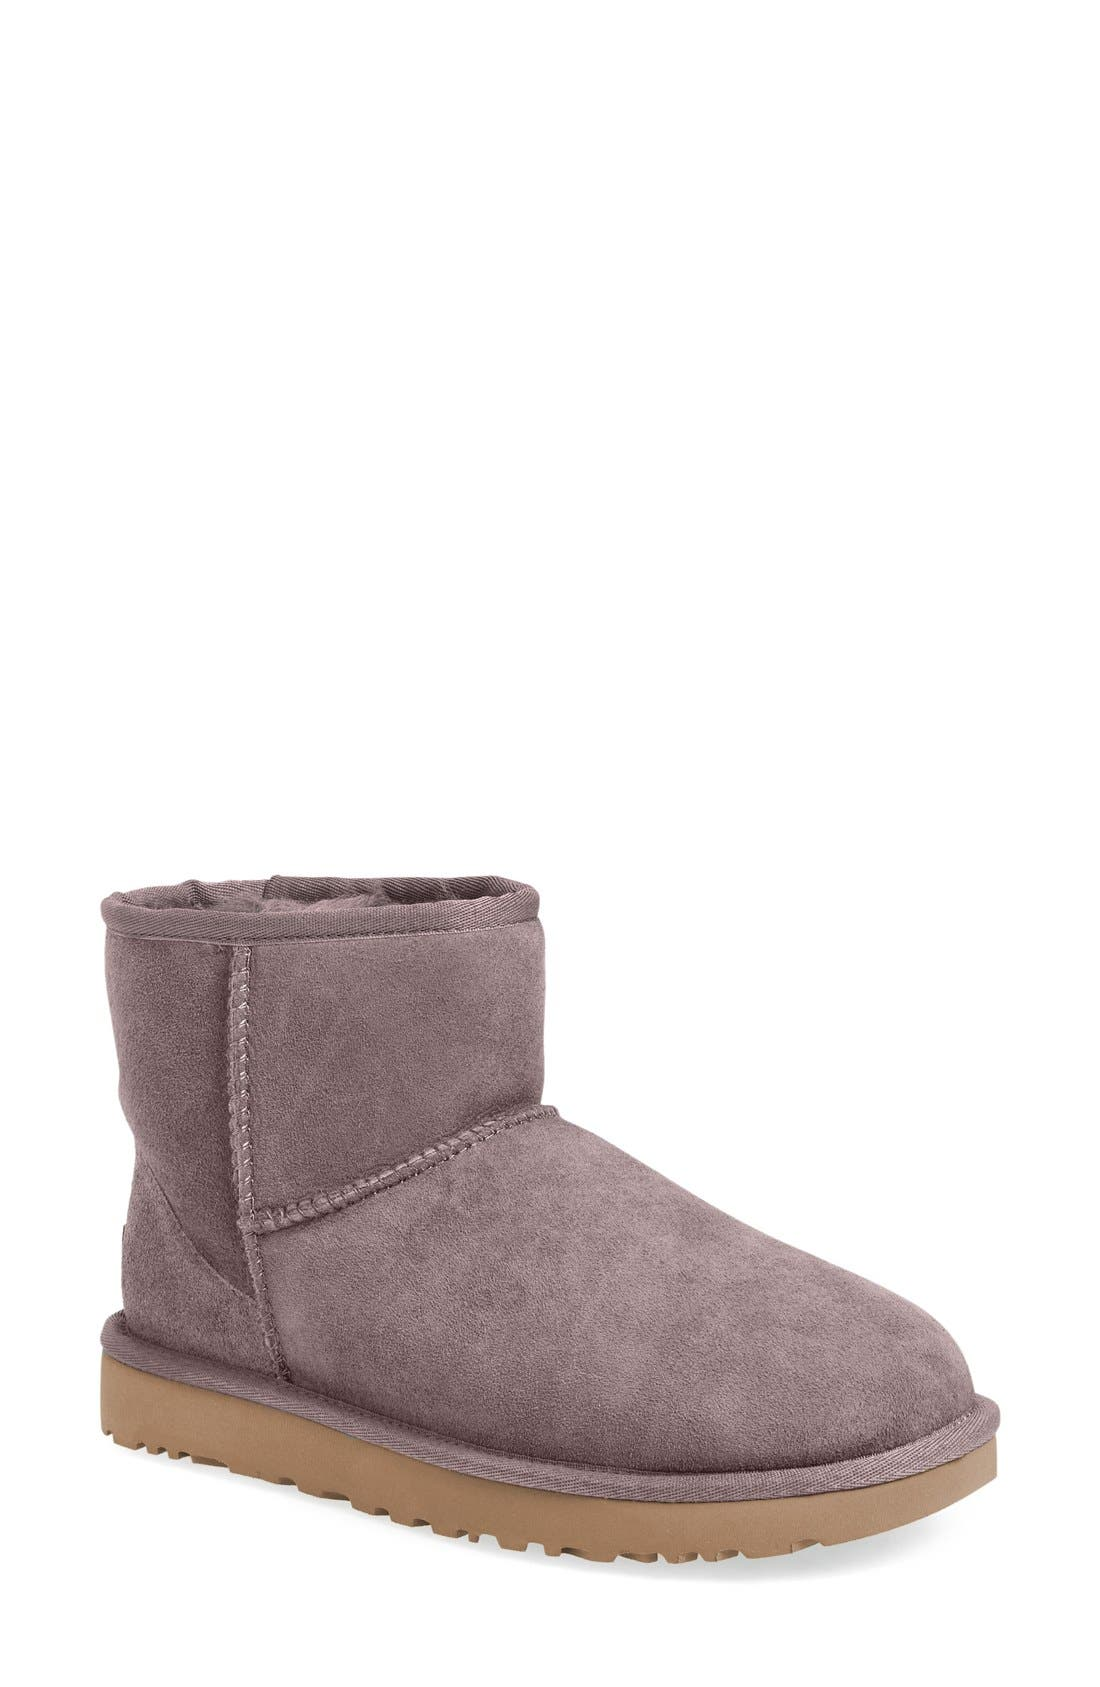 Women's Shoes Sale \u0026 Clearance | Nordstrom